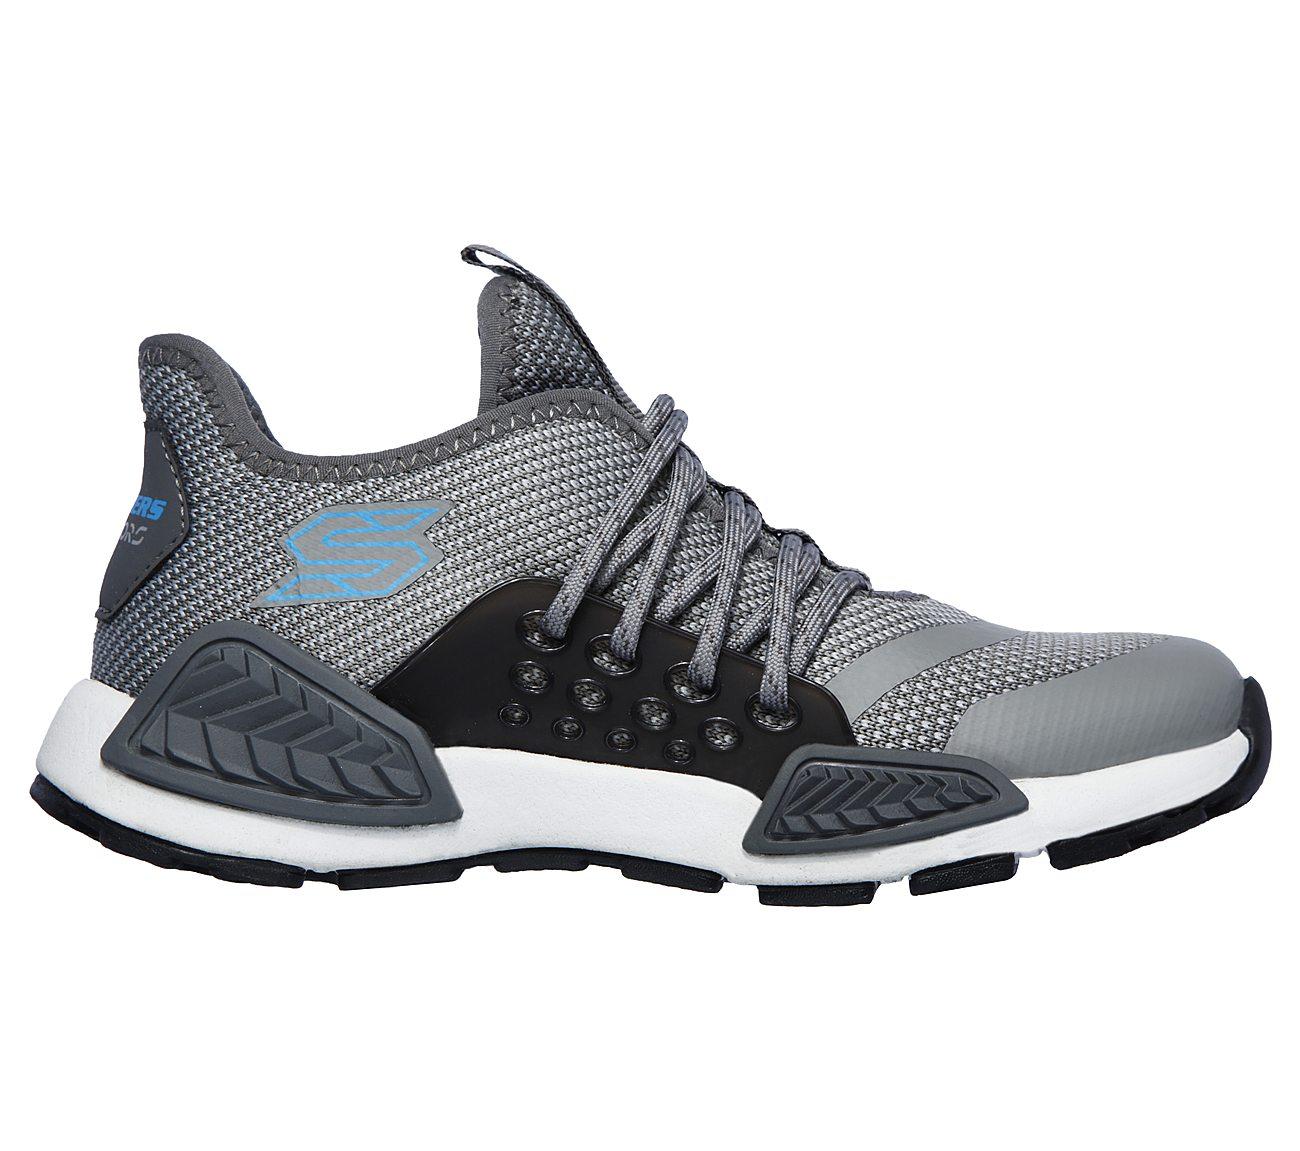 Buy SKECHERS Kinectors - Megahertz SKECHERS Sport Shoes only £39.00 f9cd908d00